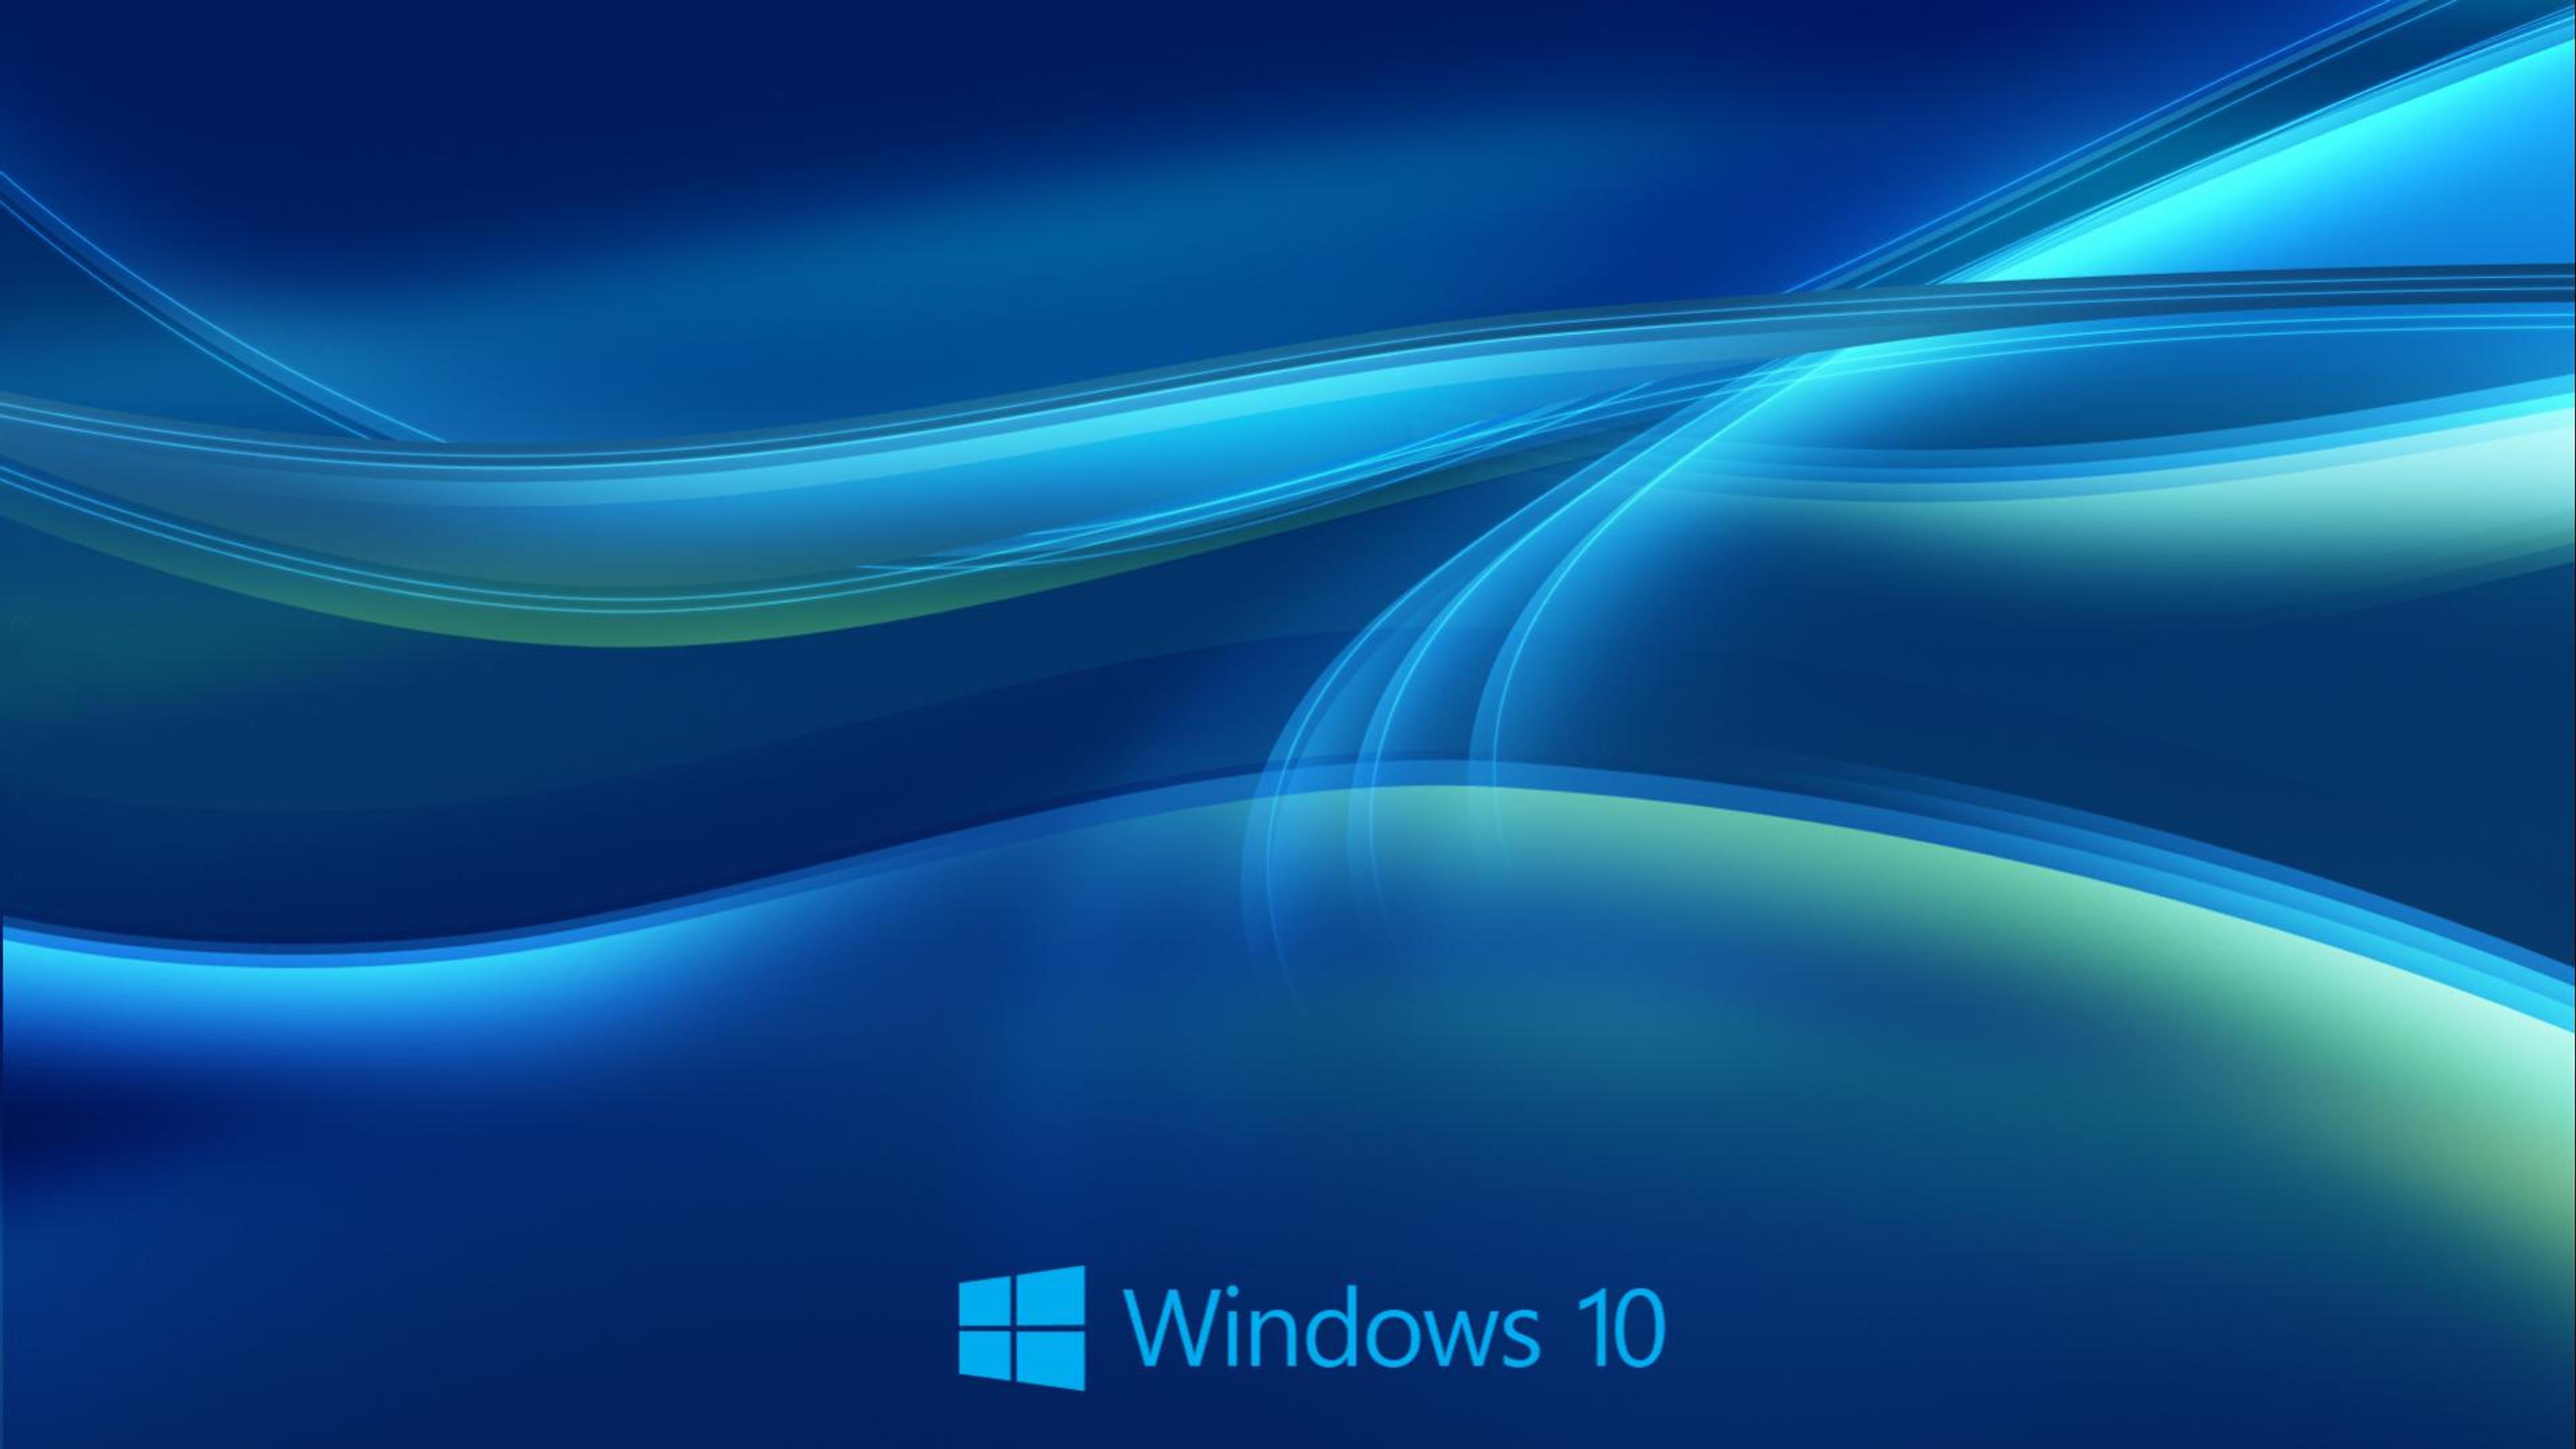 Acura Of The Desert >> HD blue lines - Beautiful windows 10 wallpaper Wallpaper Download 3840x2160